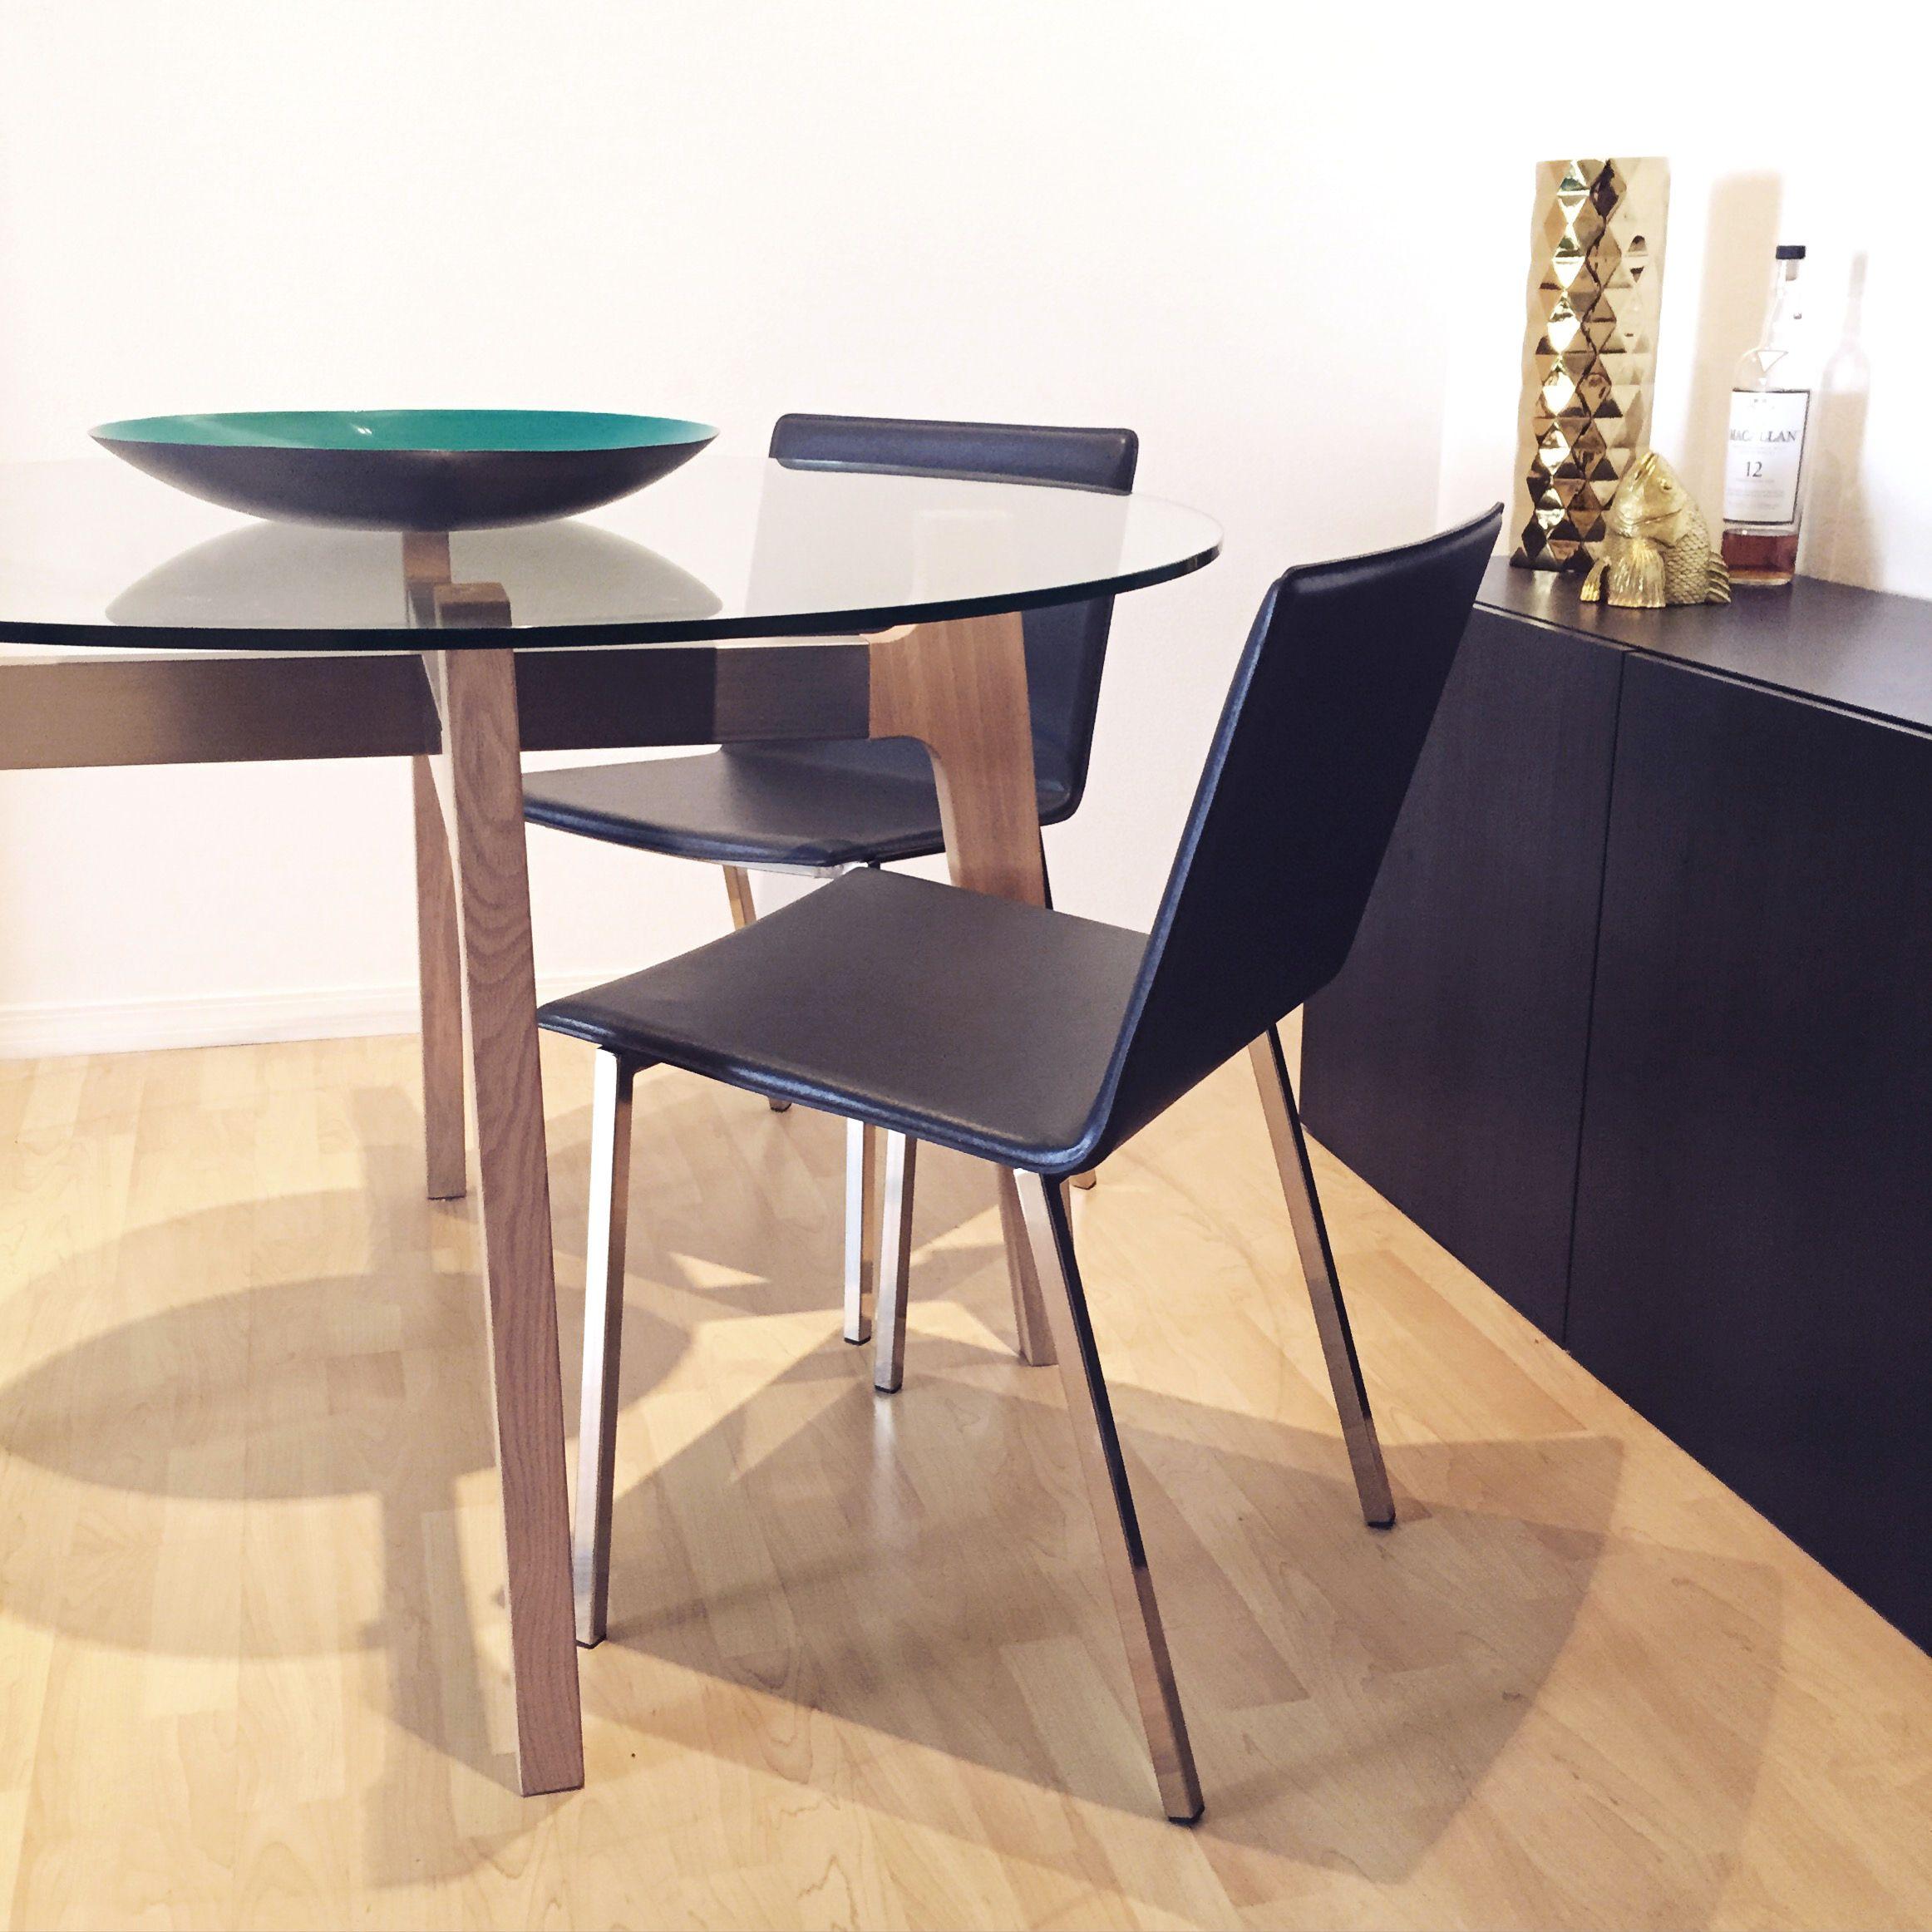 Dining Room Furniture Phoenix: Brace Dining Table & Phoenix Chairs